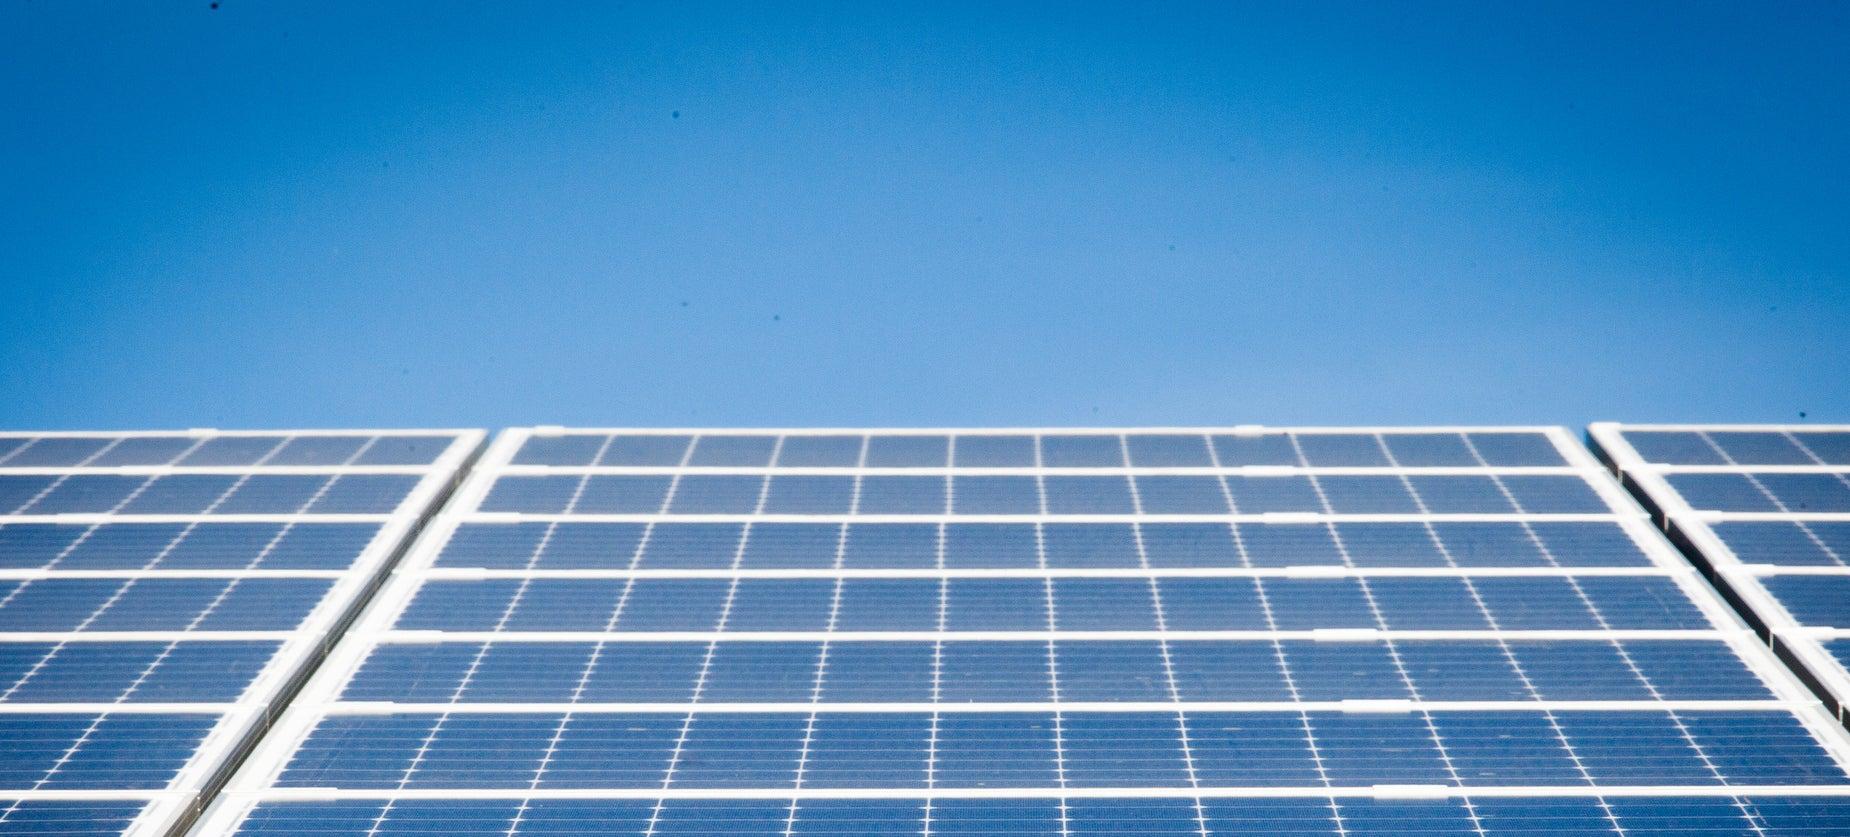 Amazon's Building a Solar Farm in Virginia to Green Its Data Centres